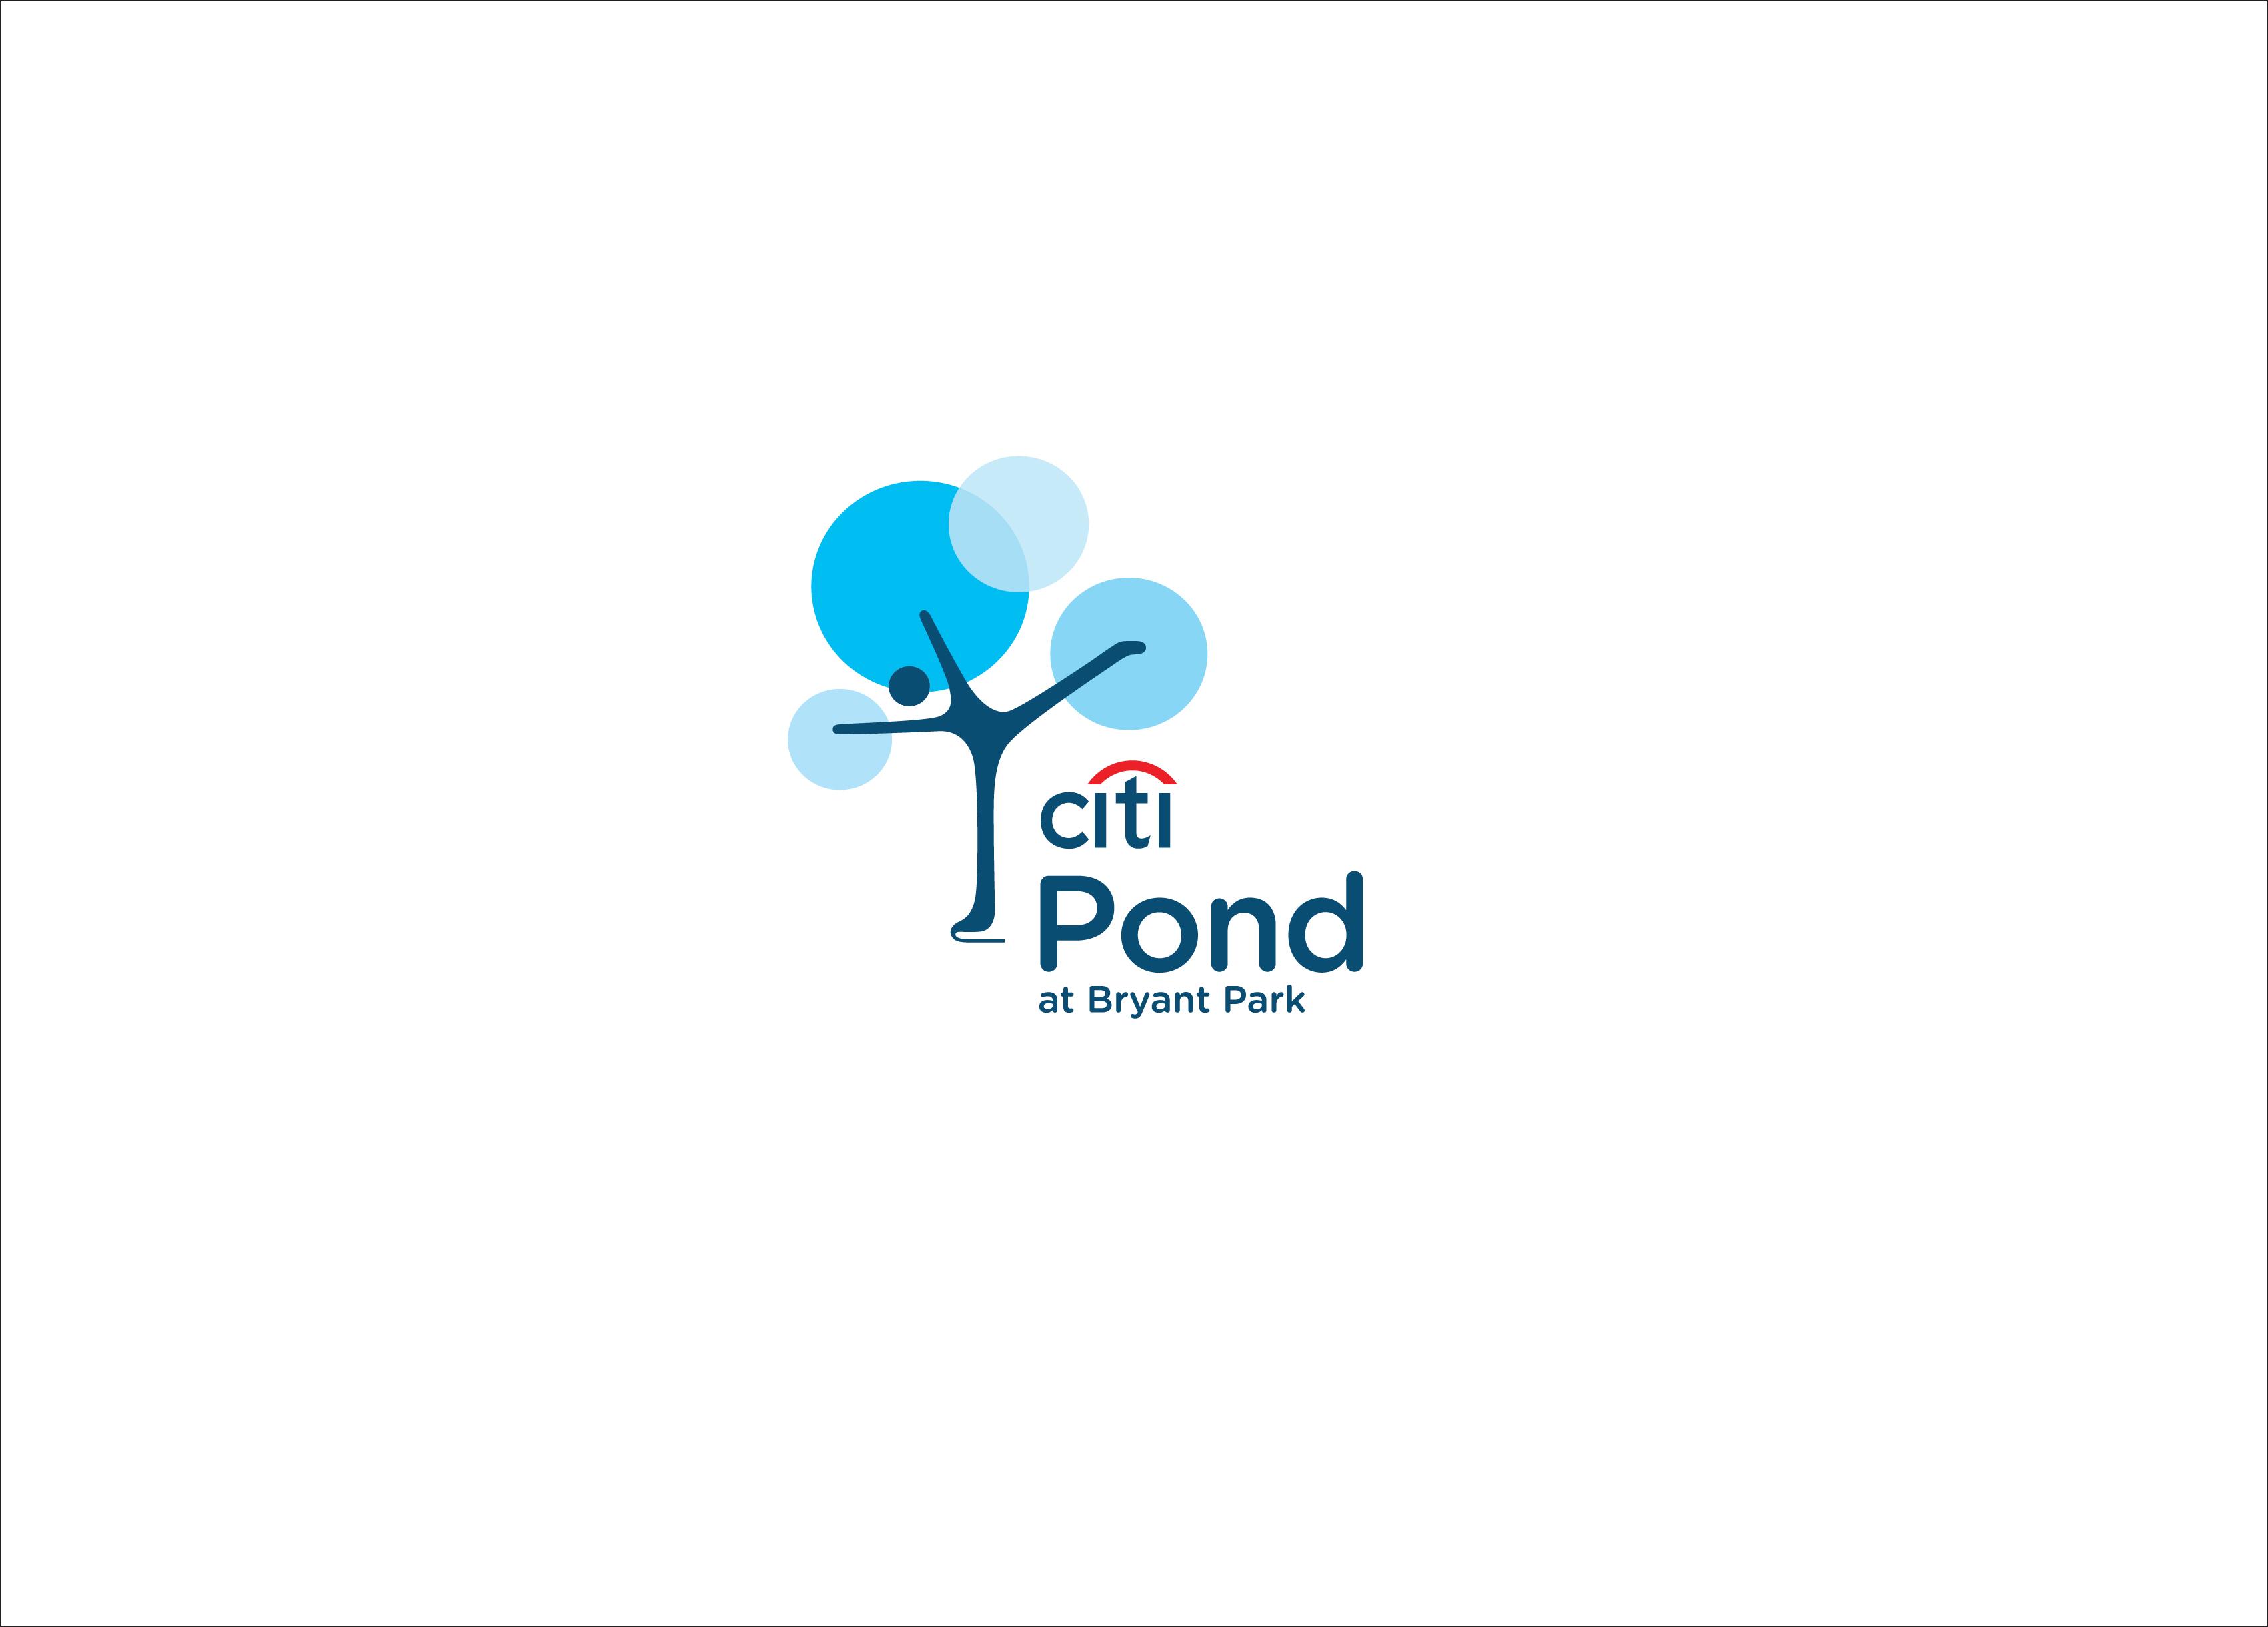 Citi Pond logo.